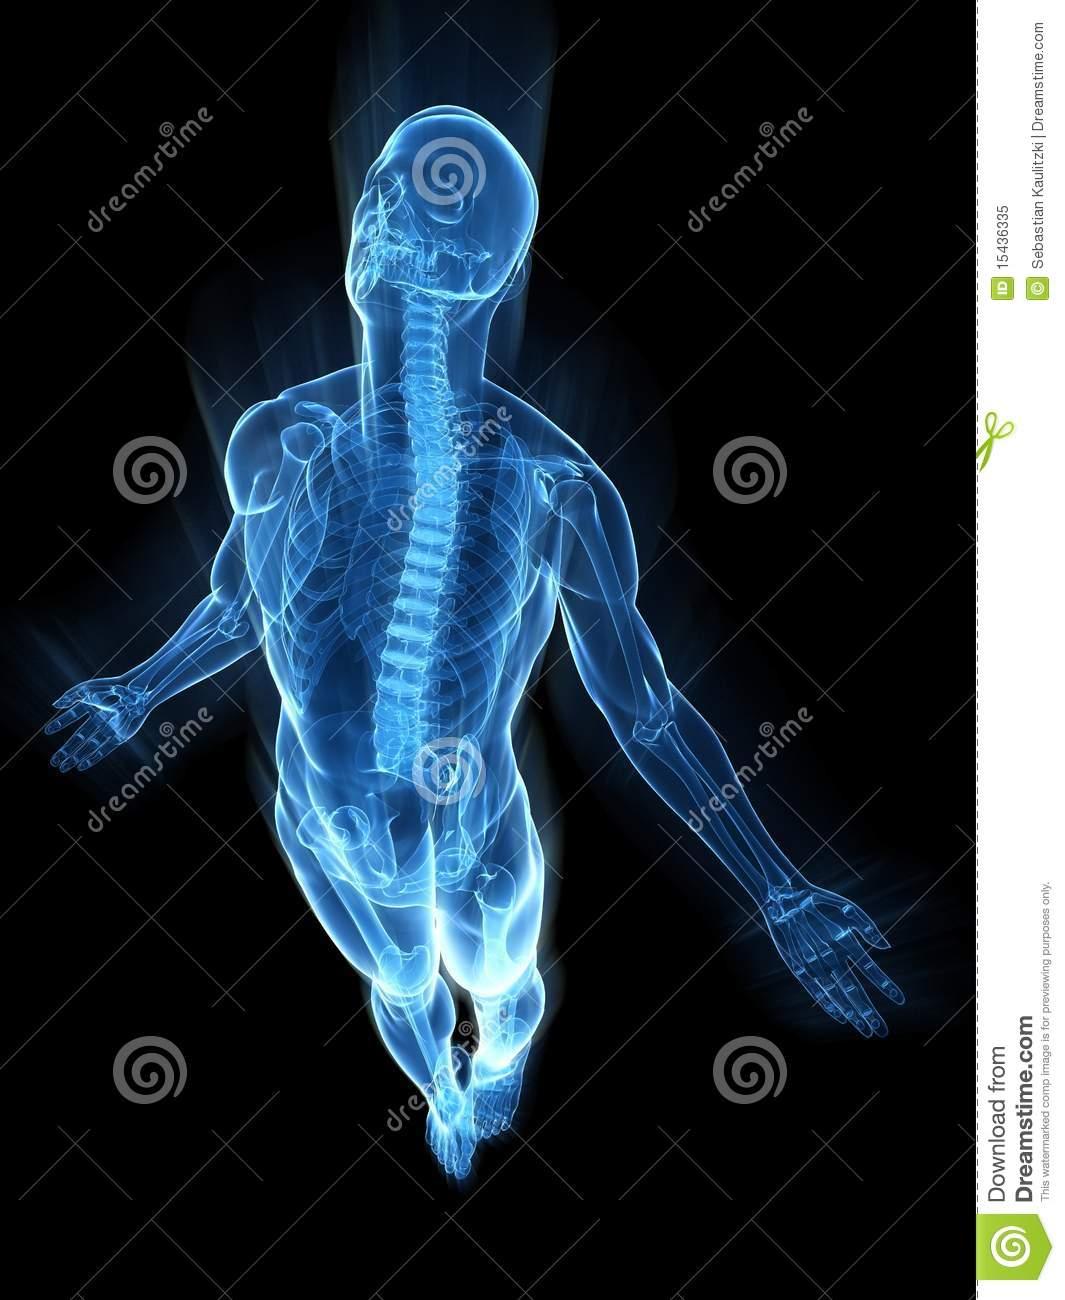 Body X-ray Clipart - Clipart Kid